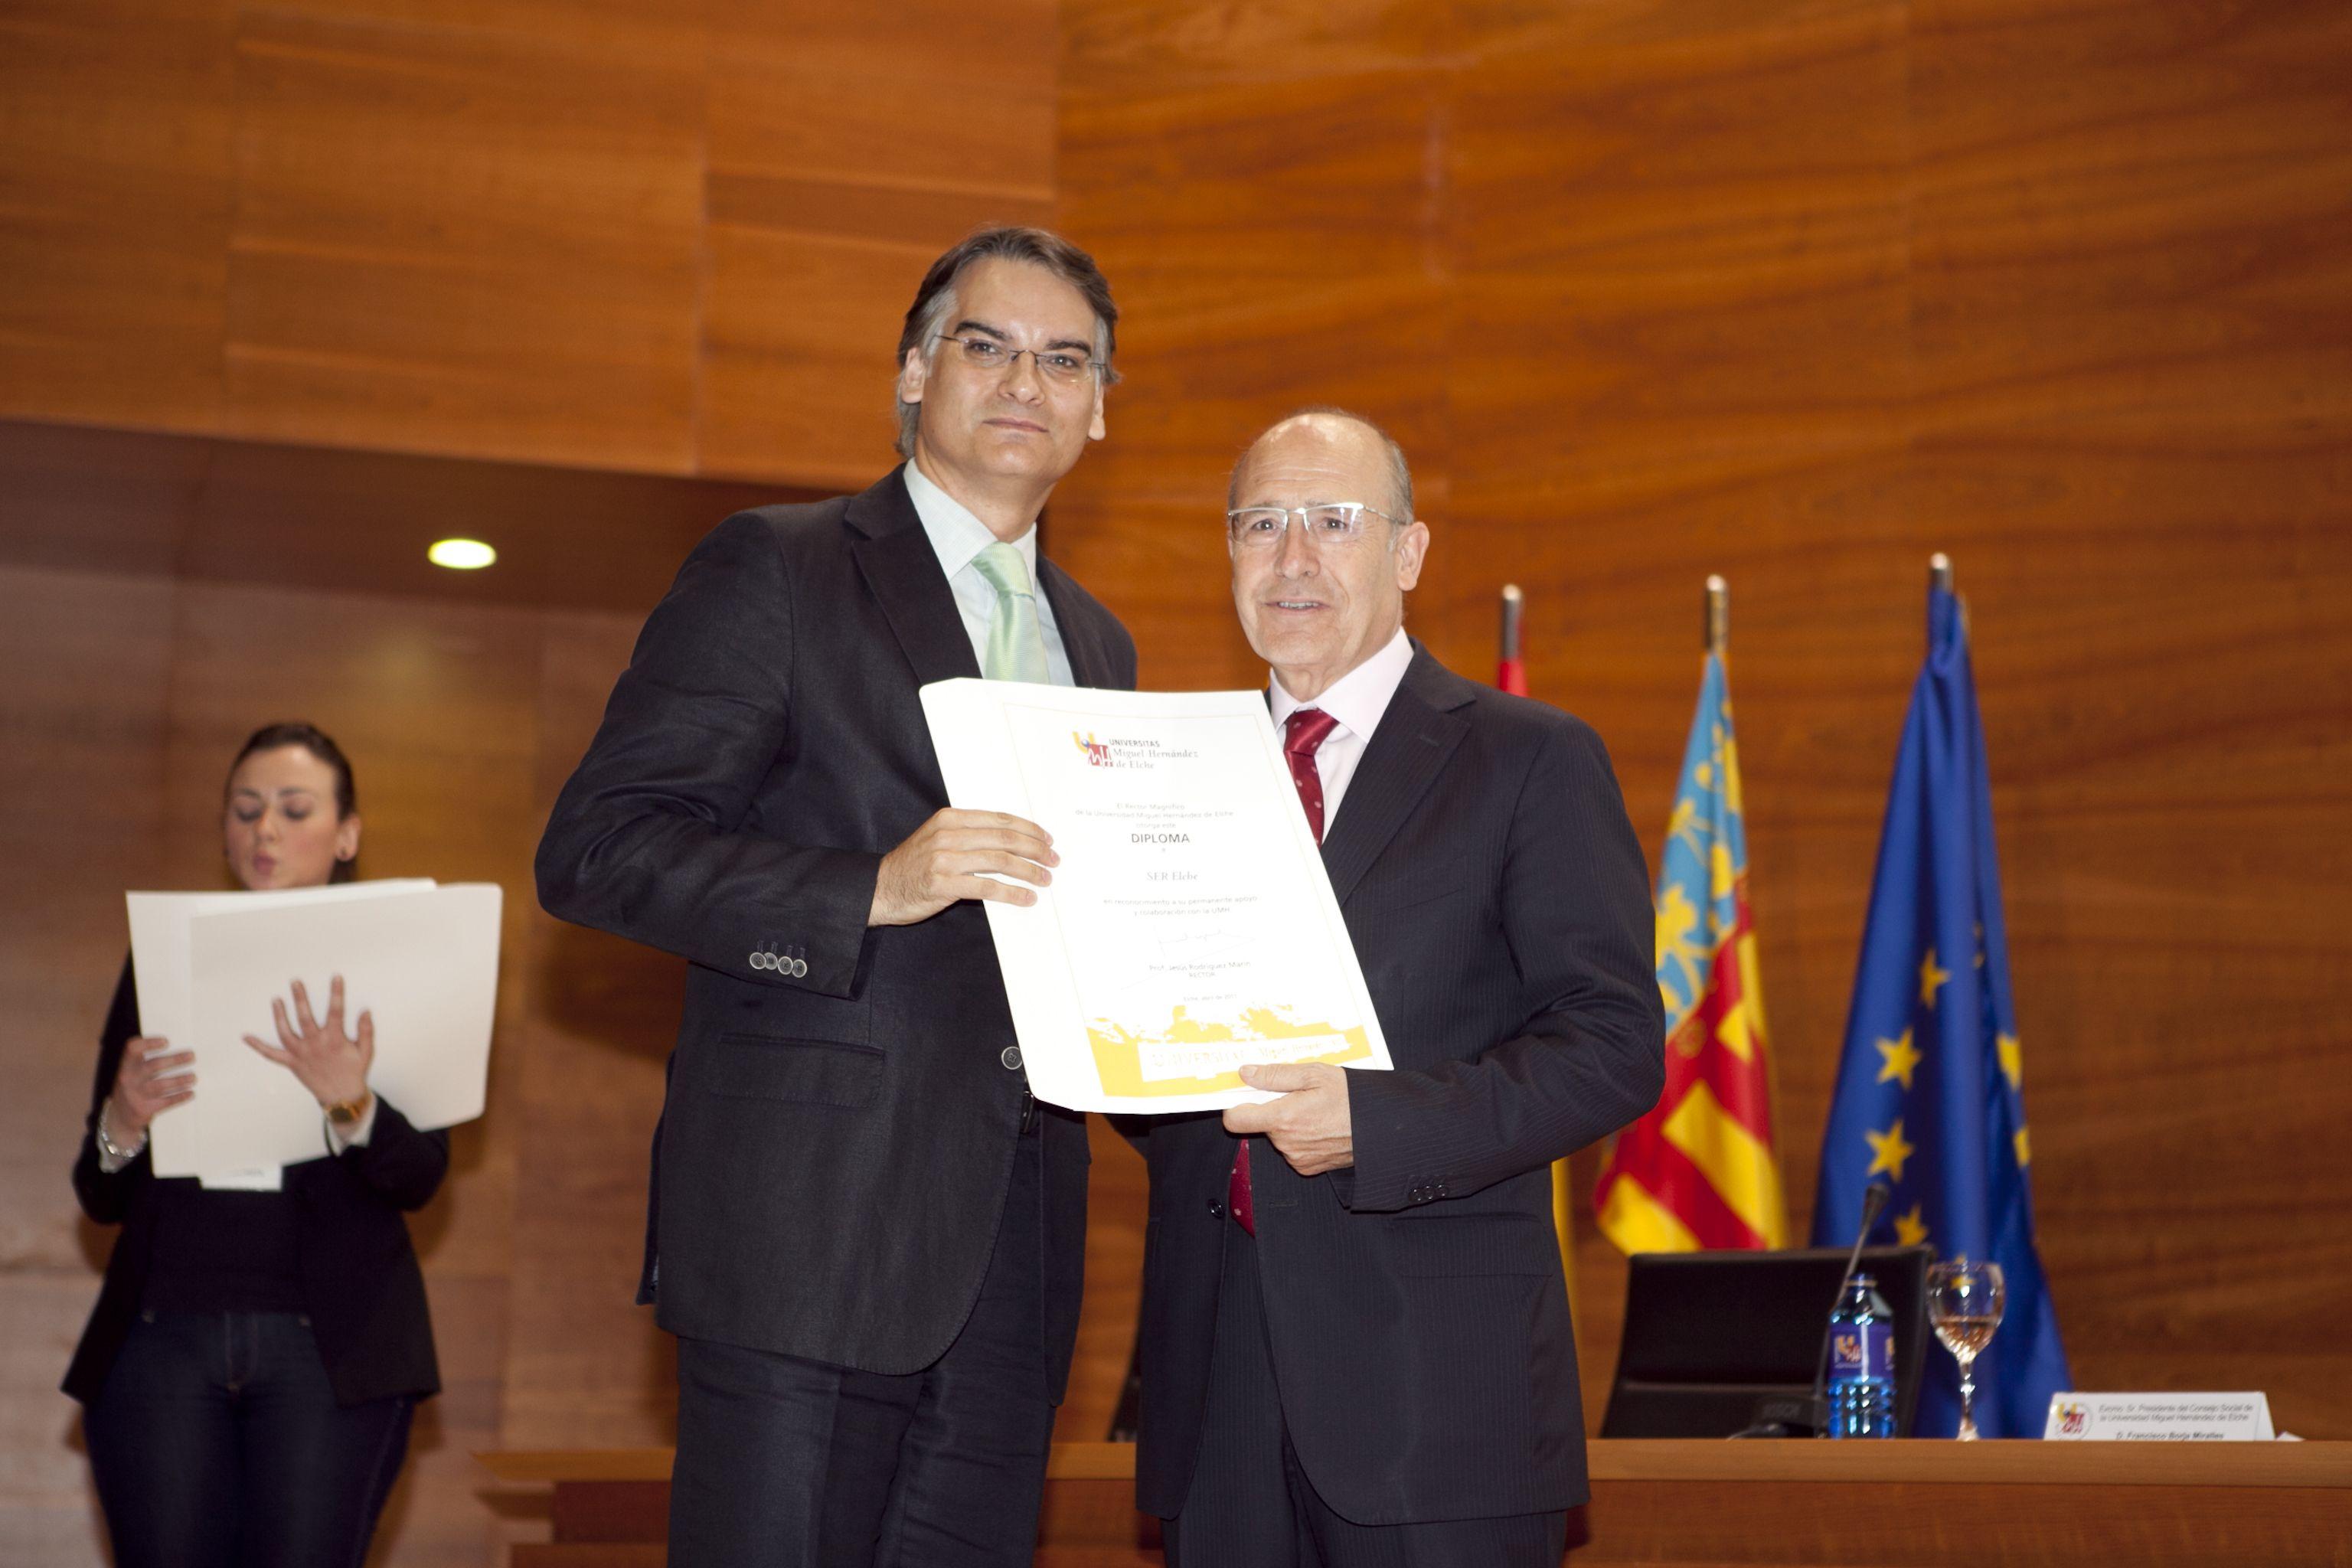 umh-diplomas-rector_mg_6884.jpg